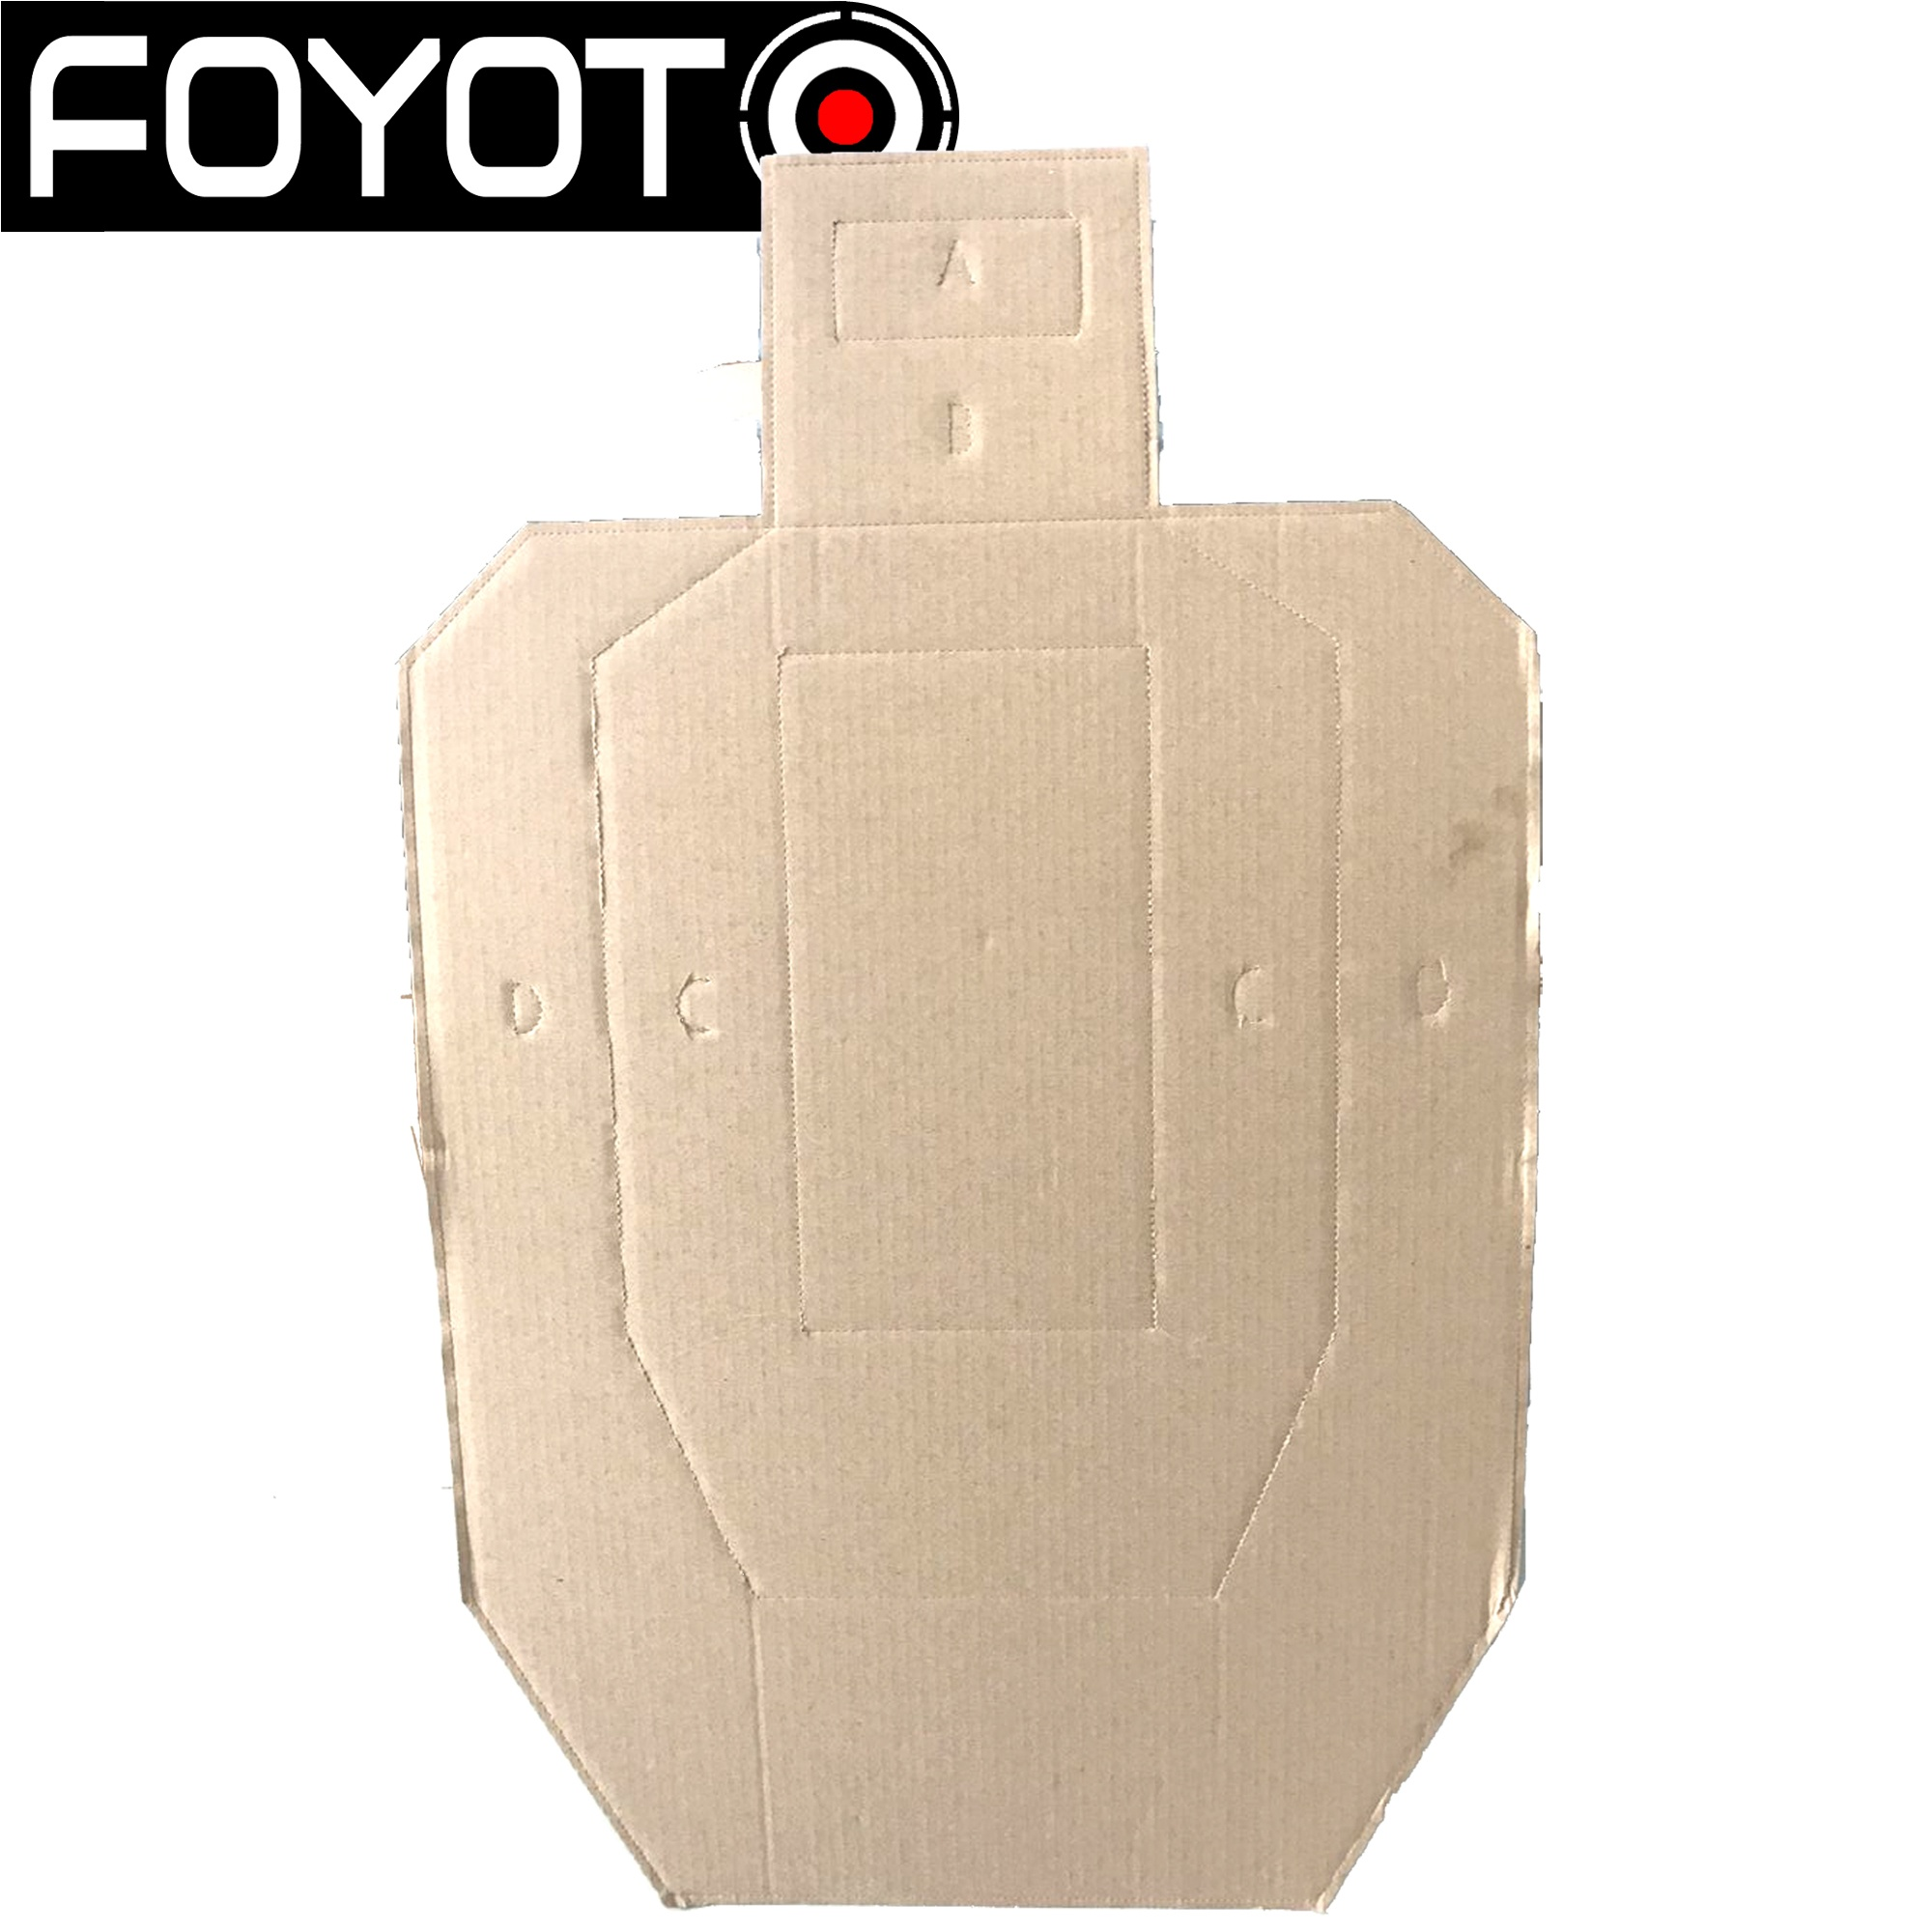 new design 2021 Training cheap IPSC/USPSA Cardboard shooting Targets games toys